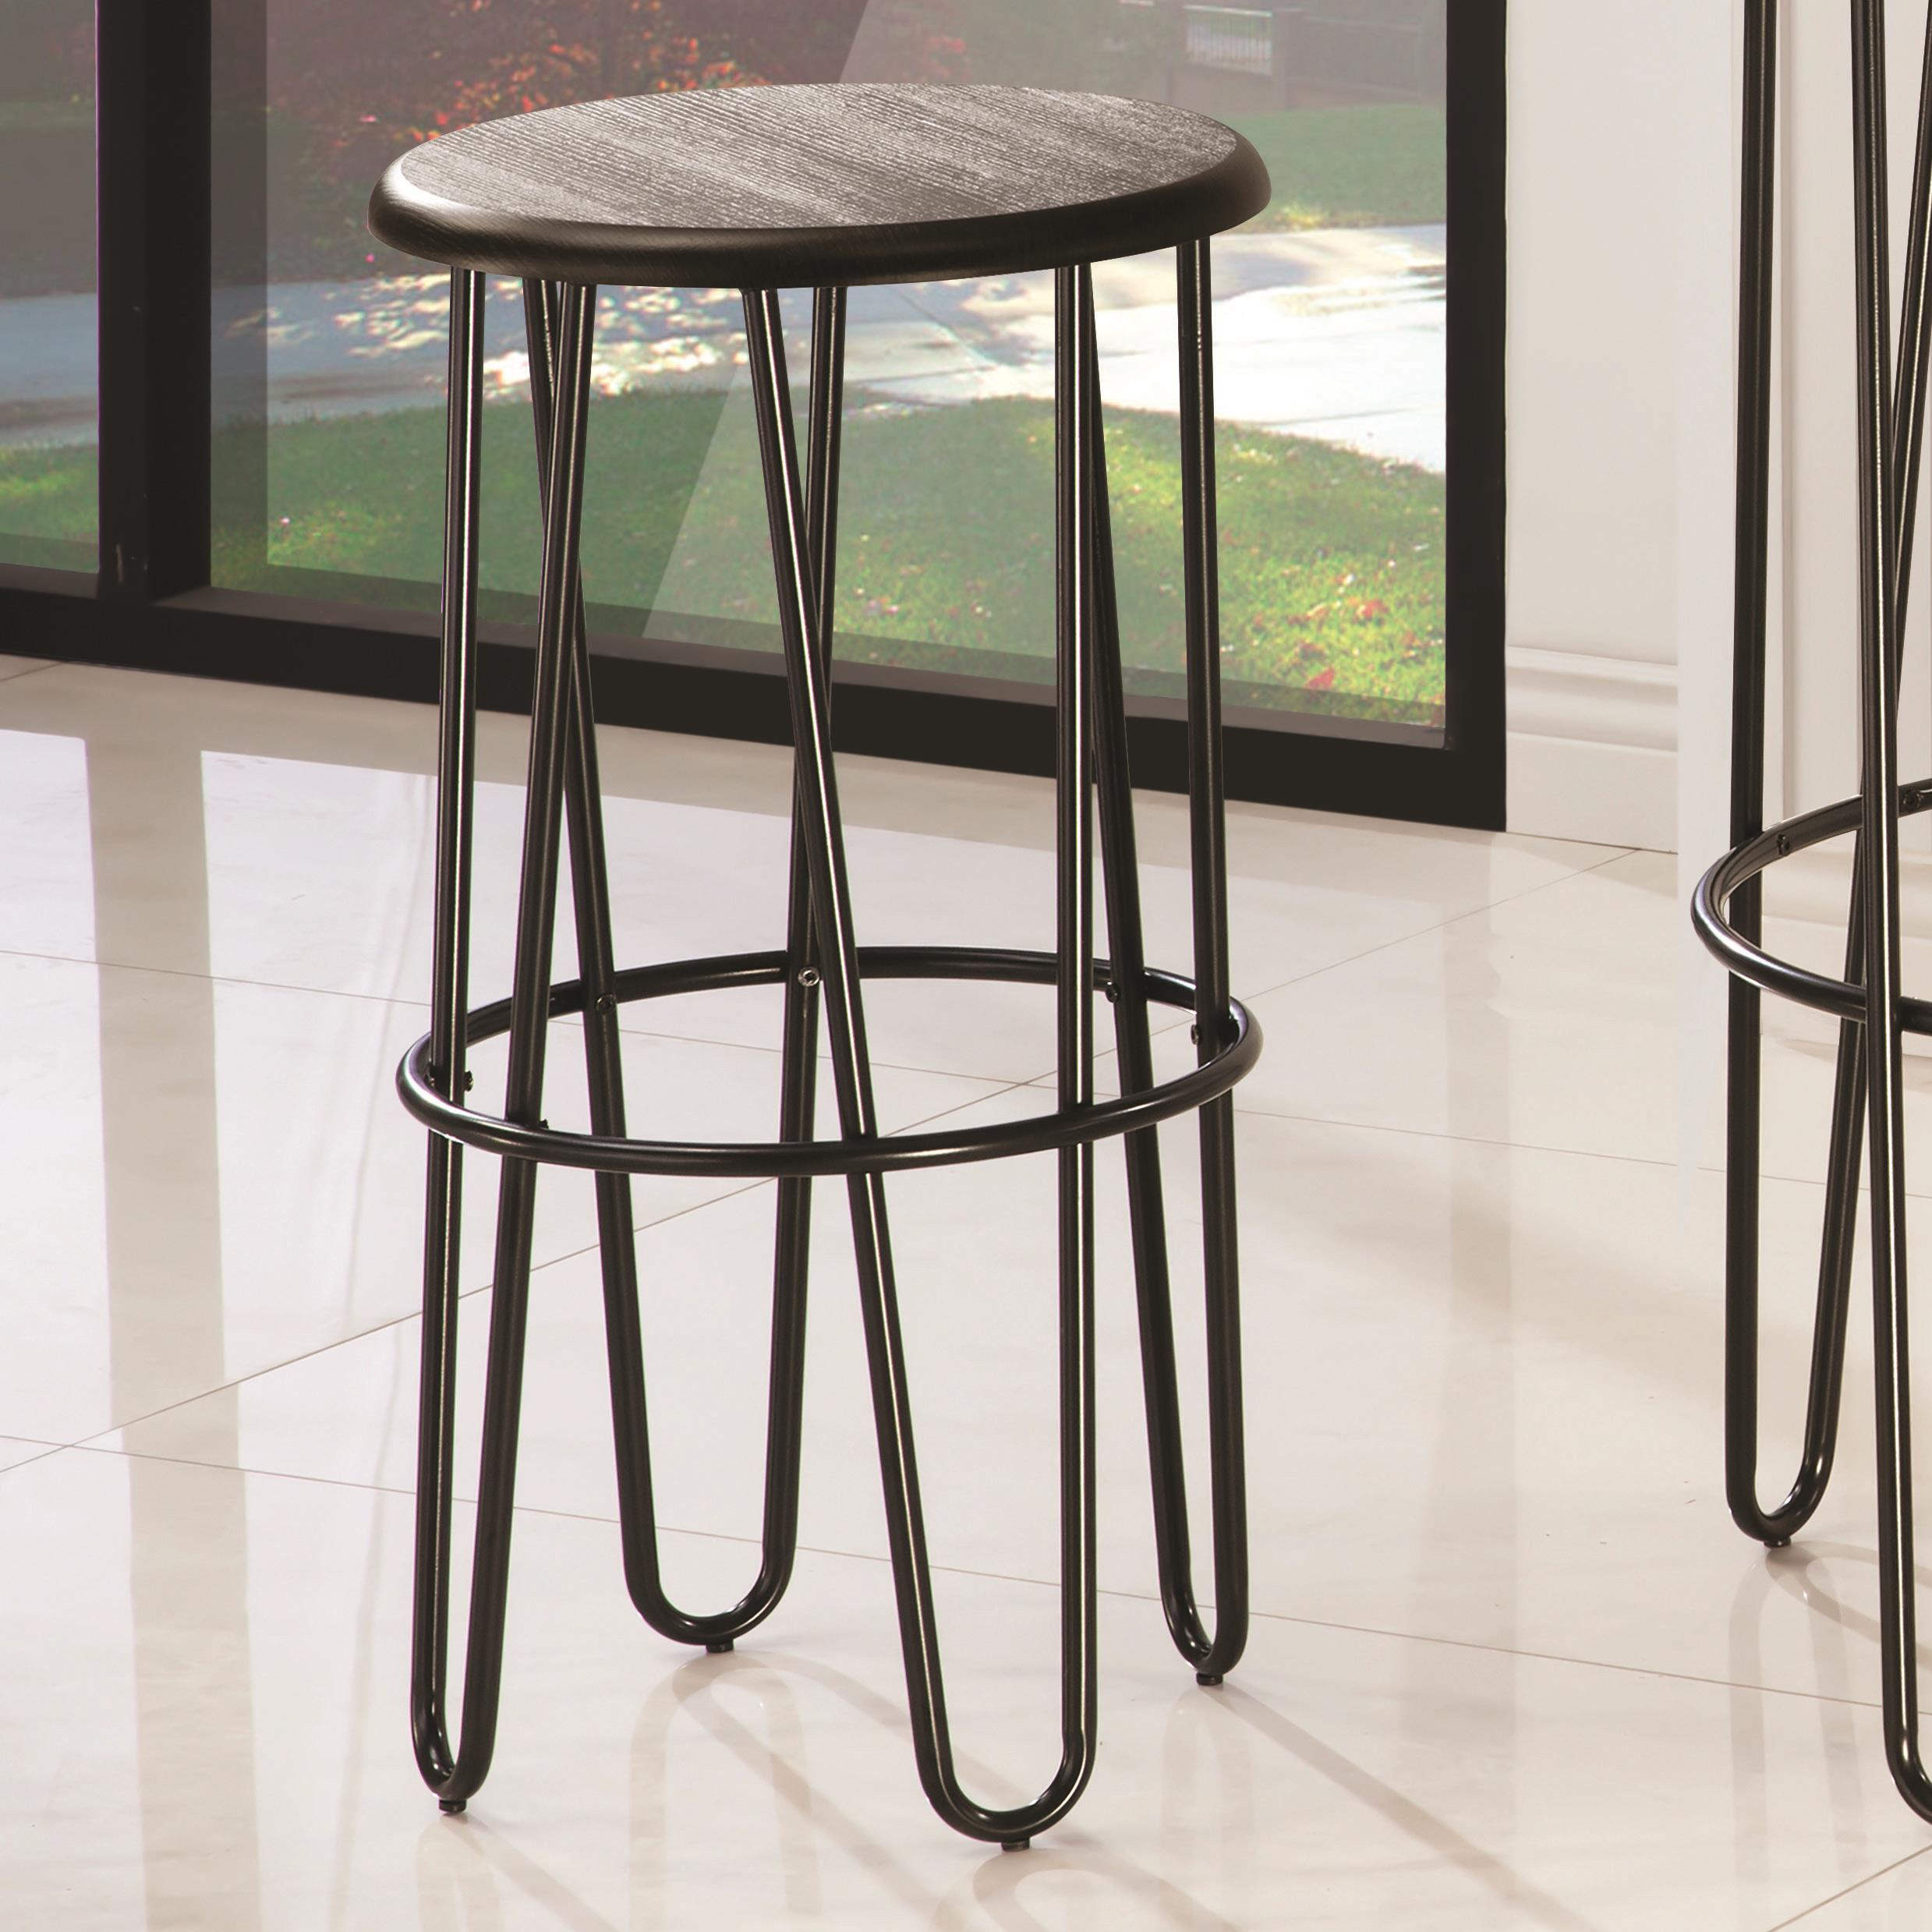 Coaster Bar Units and Bar Tables Bar Stool - Item Number: 101424